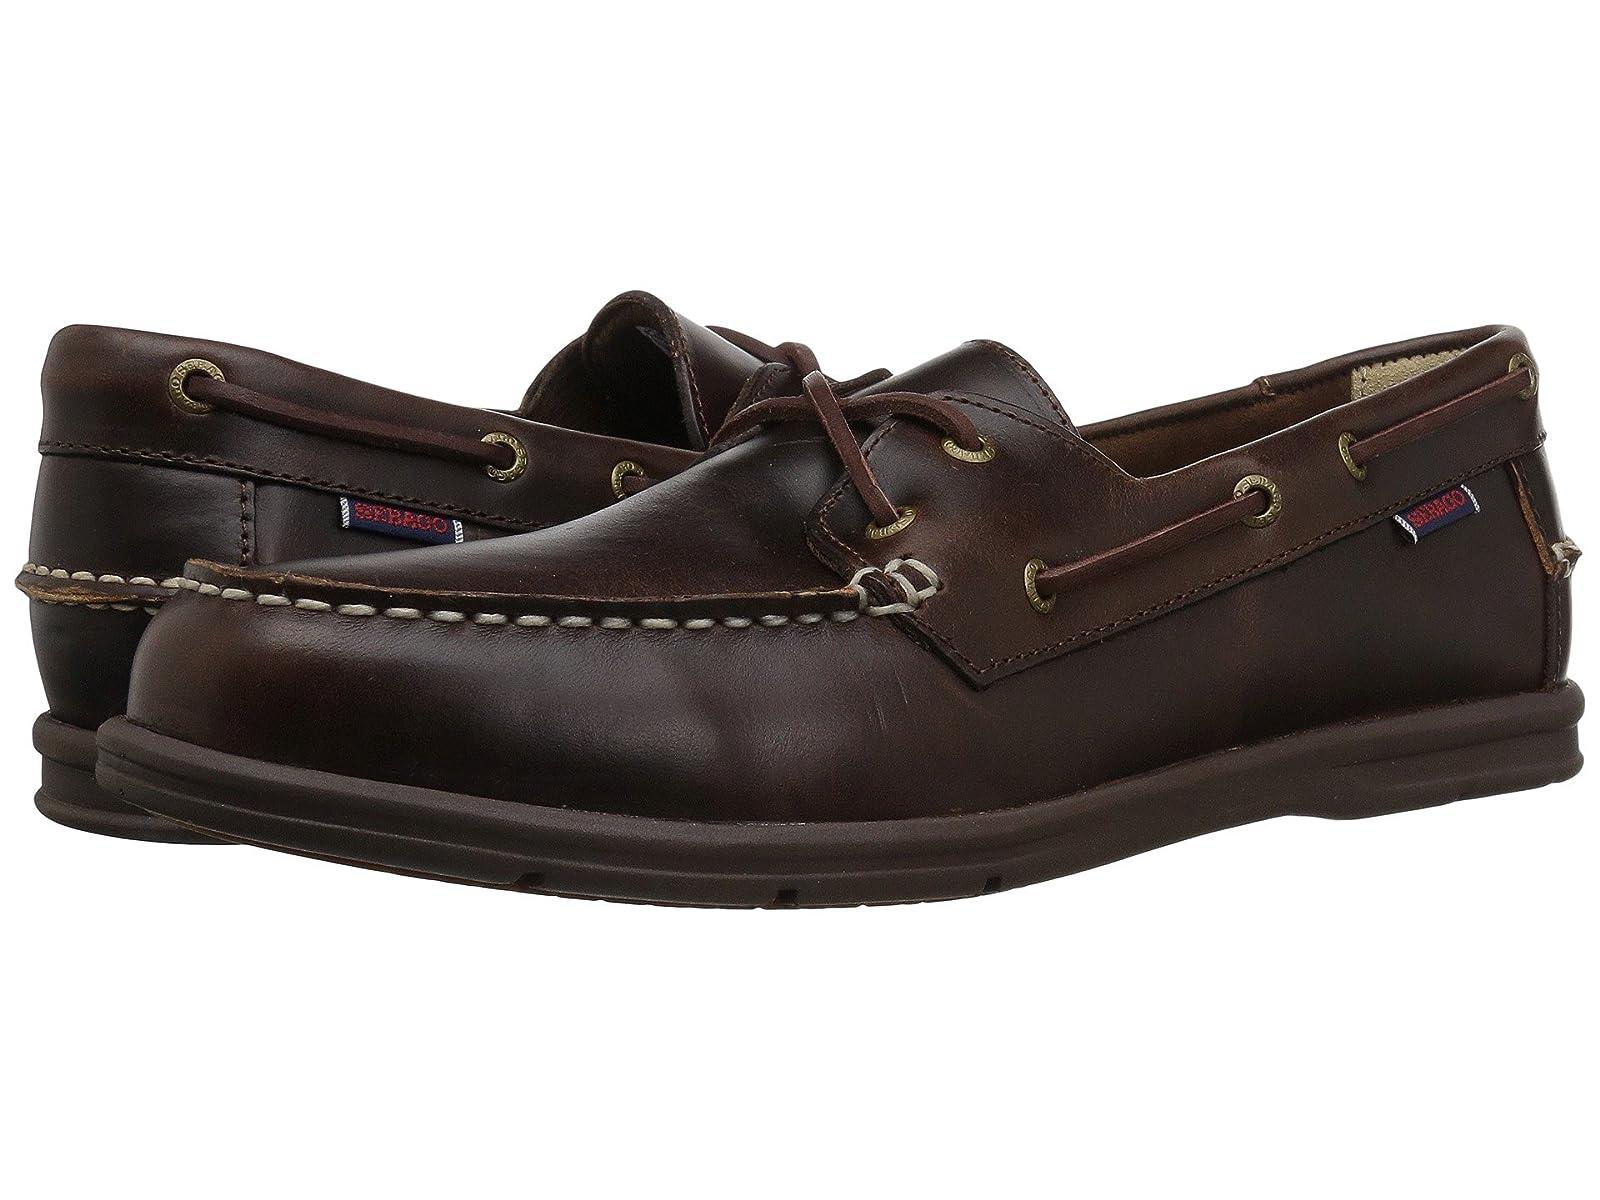 Sebago Litesides Two EyeSelling fashionable and eye-catching shoes